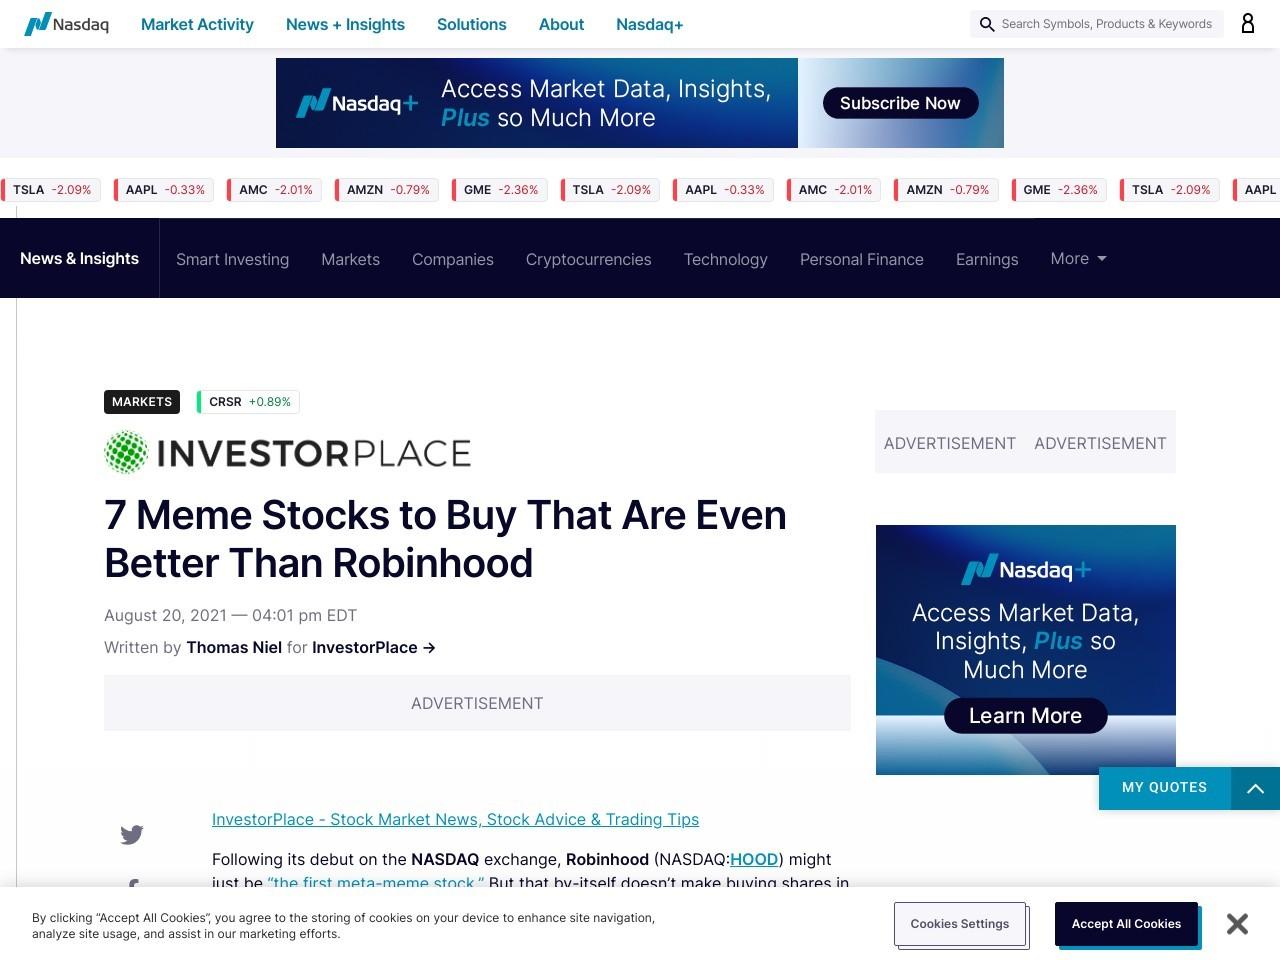 7 Meme Stocks to Buy That Are Even Better Than Robinhood – Nasdaq